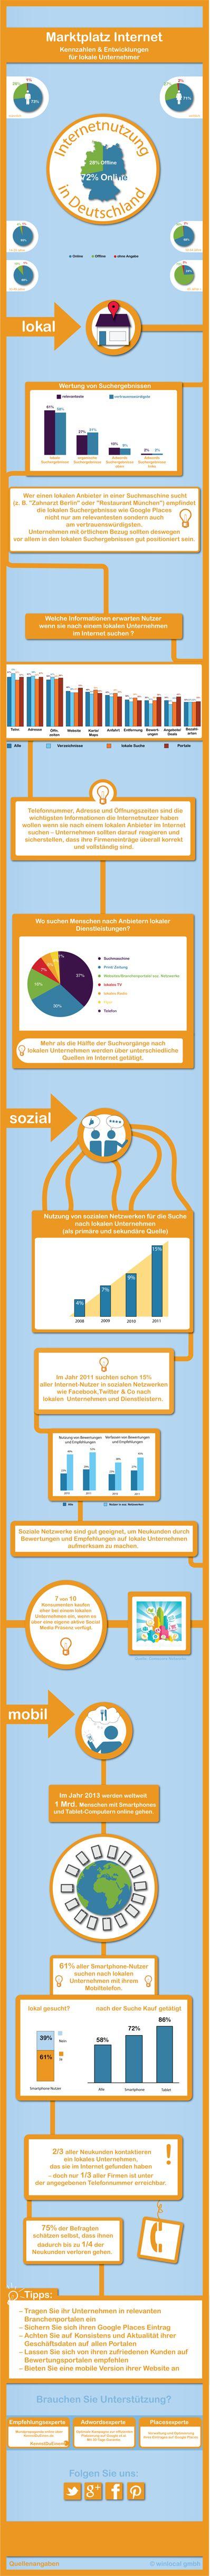 Anklickbare Infografik: Lokaler Suchmarkt in Deutschland | #Local #Search #Space in #Germany